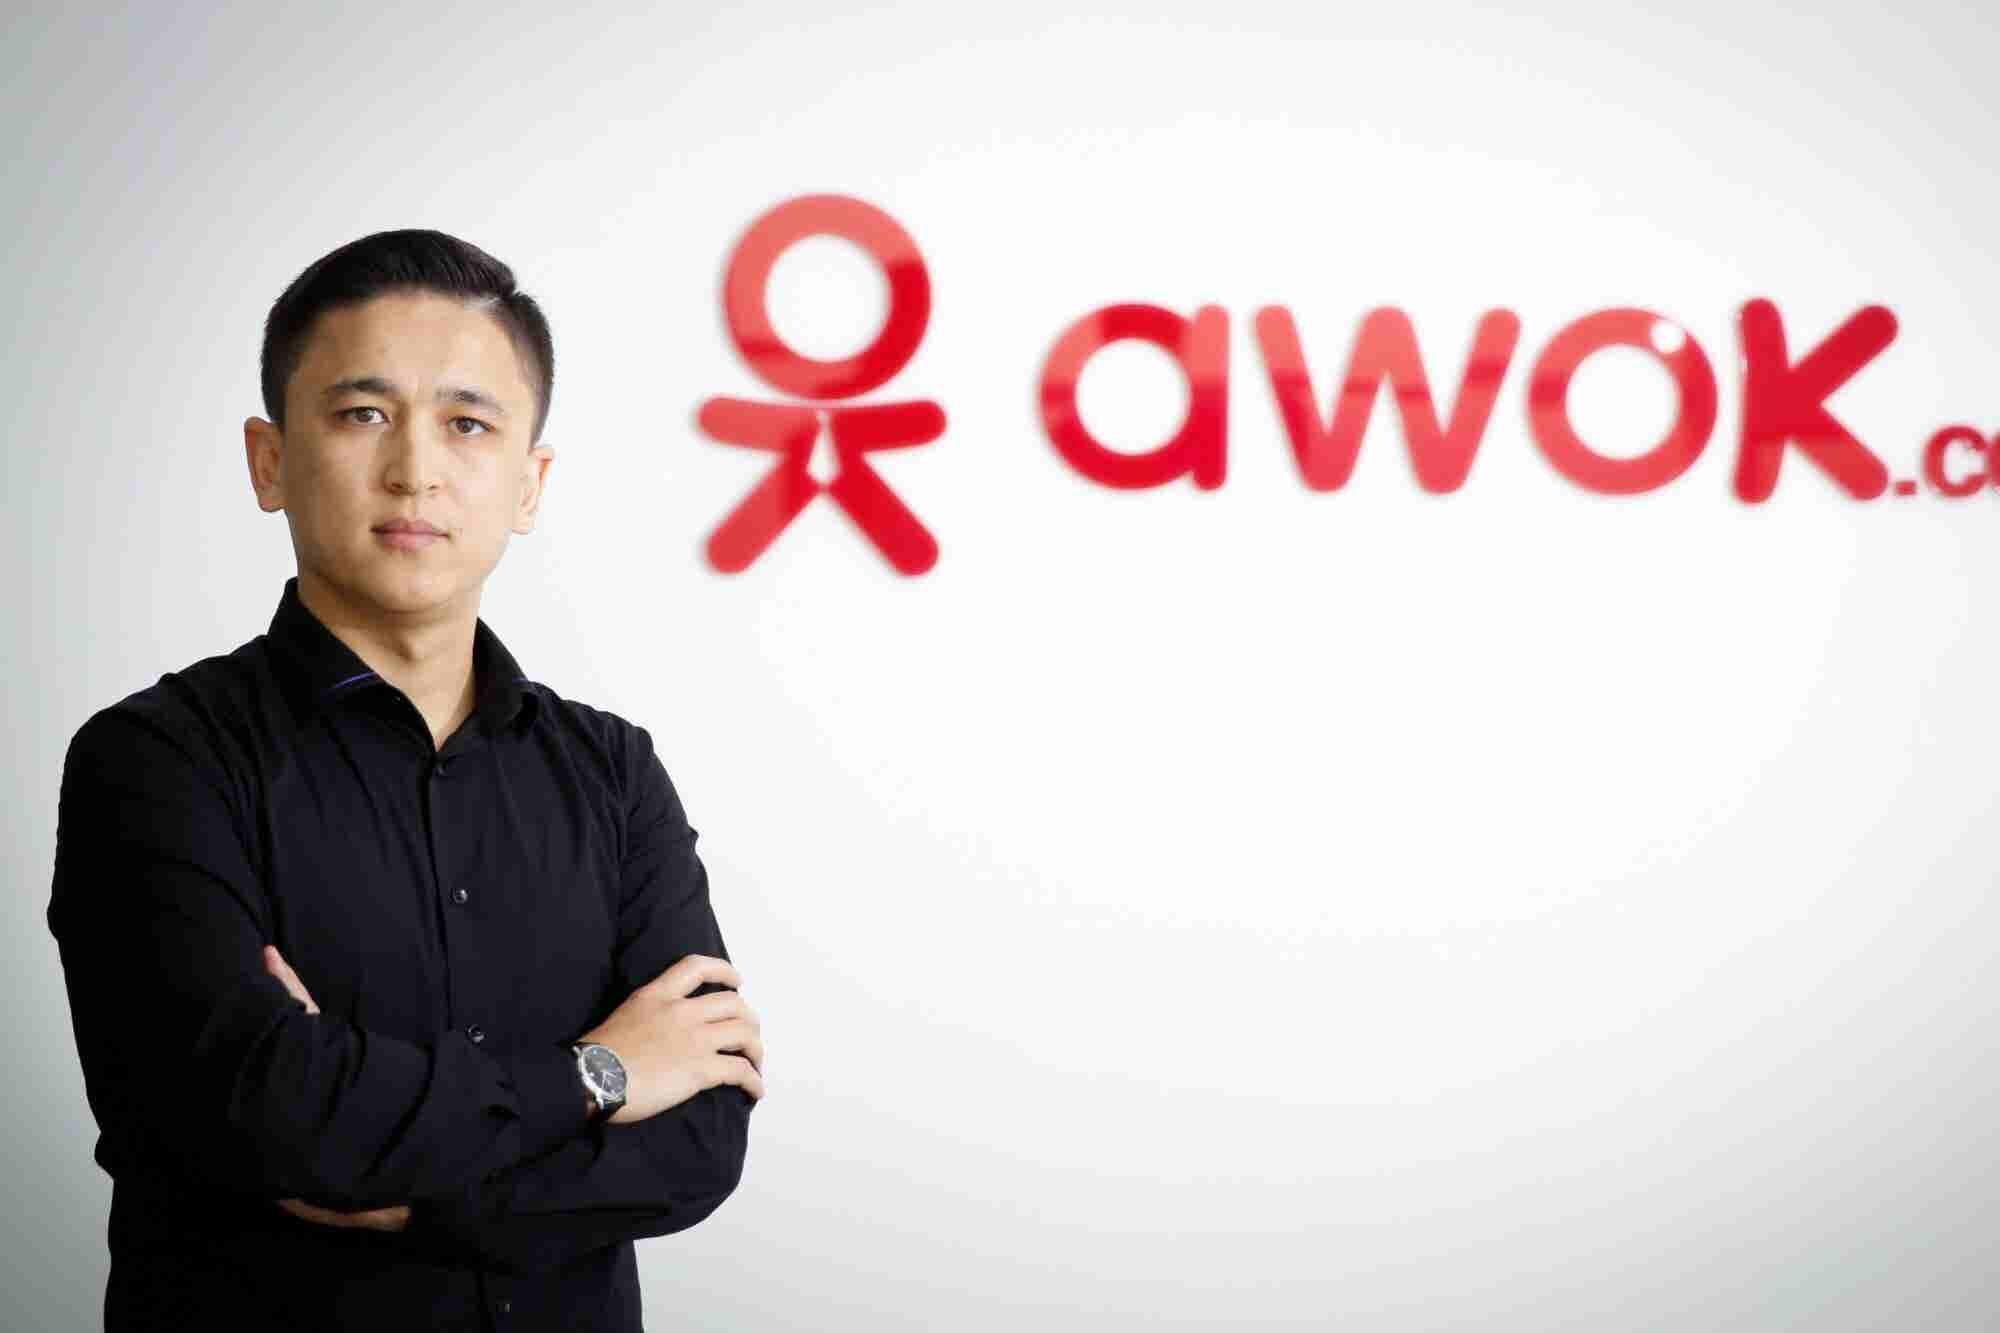 We Got Funded: UAE-Based E-Commerce Enterprise Awok Raises US$30 Million In Series A